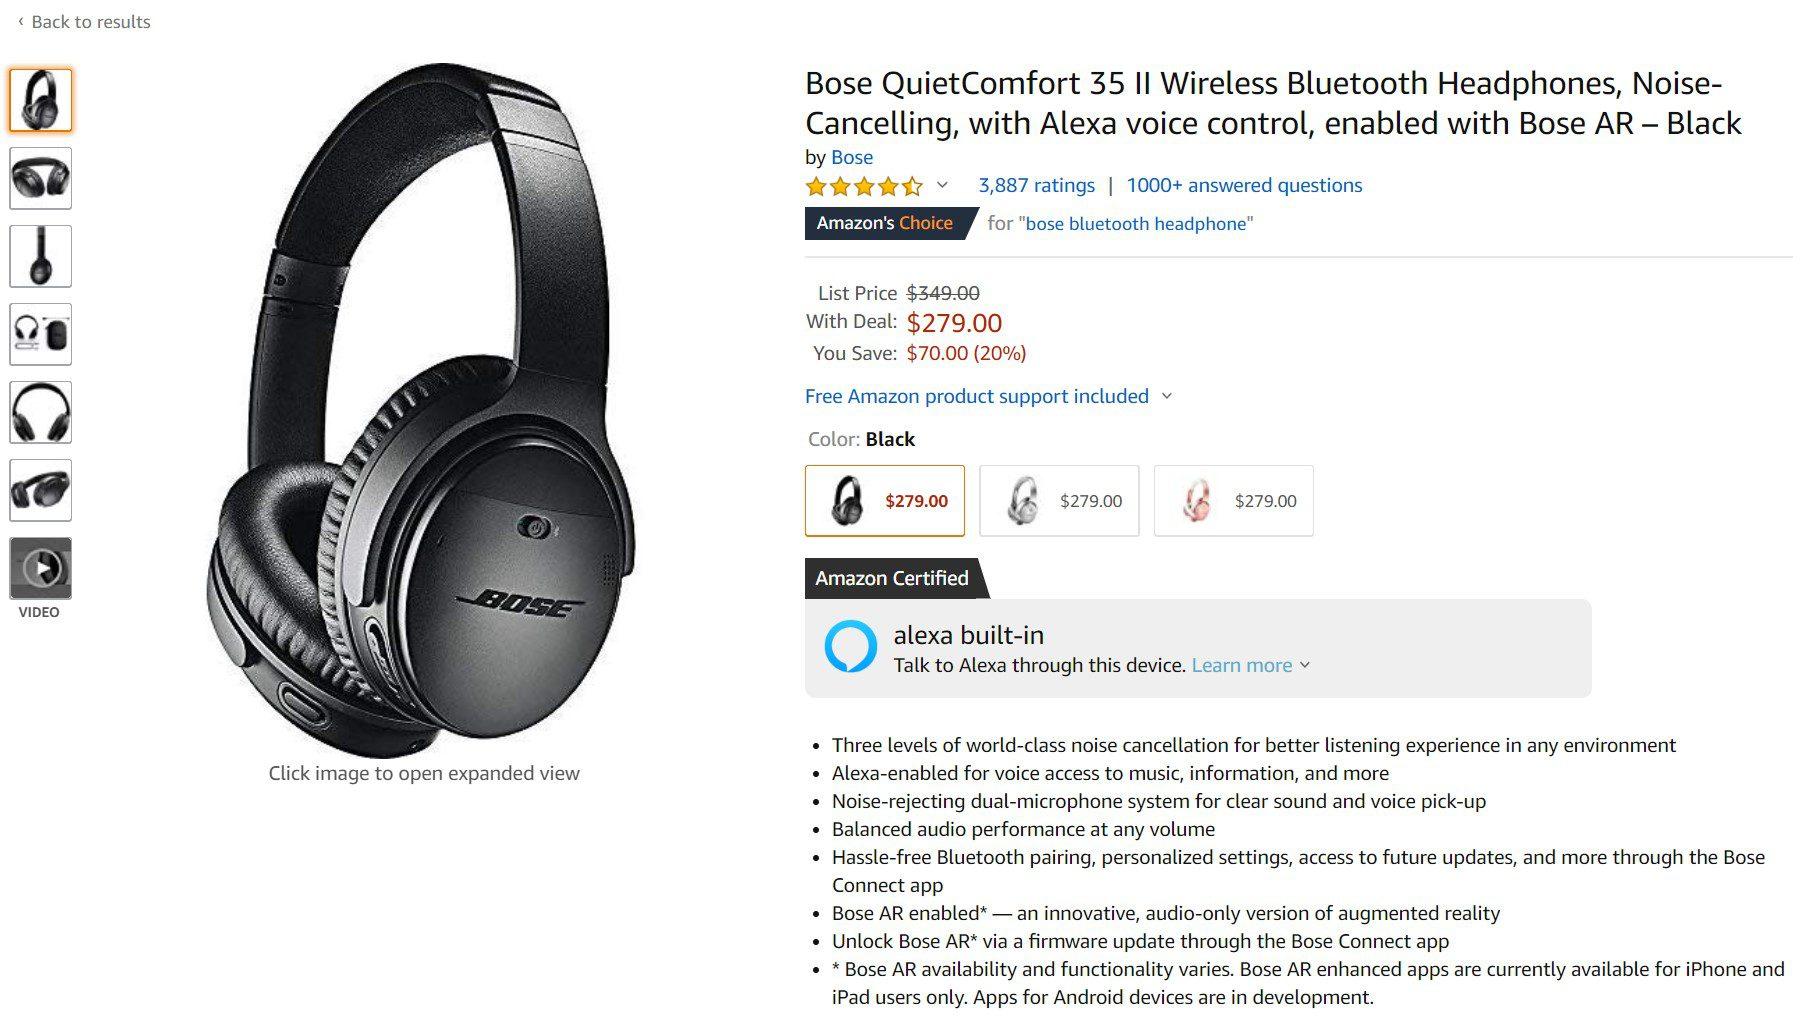 Deal Alert: Bose QC 35 II wireless headphones receive a handsome discount at Amazon 1